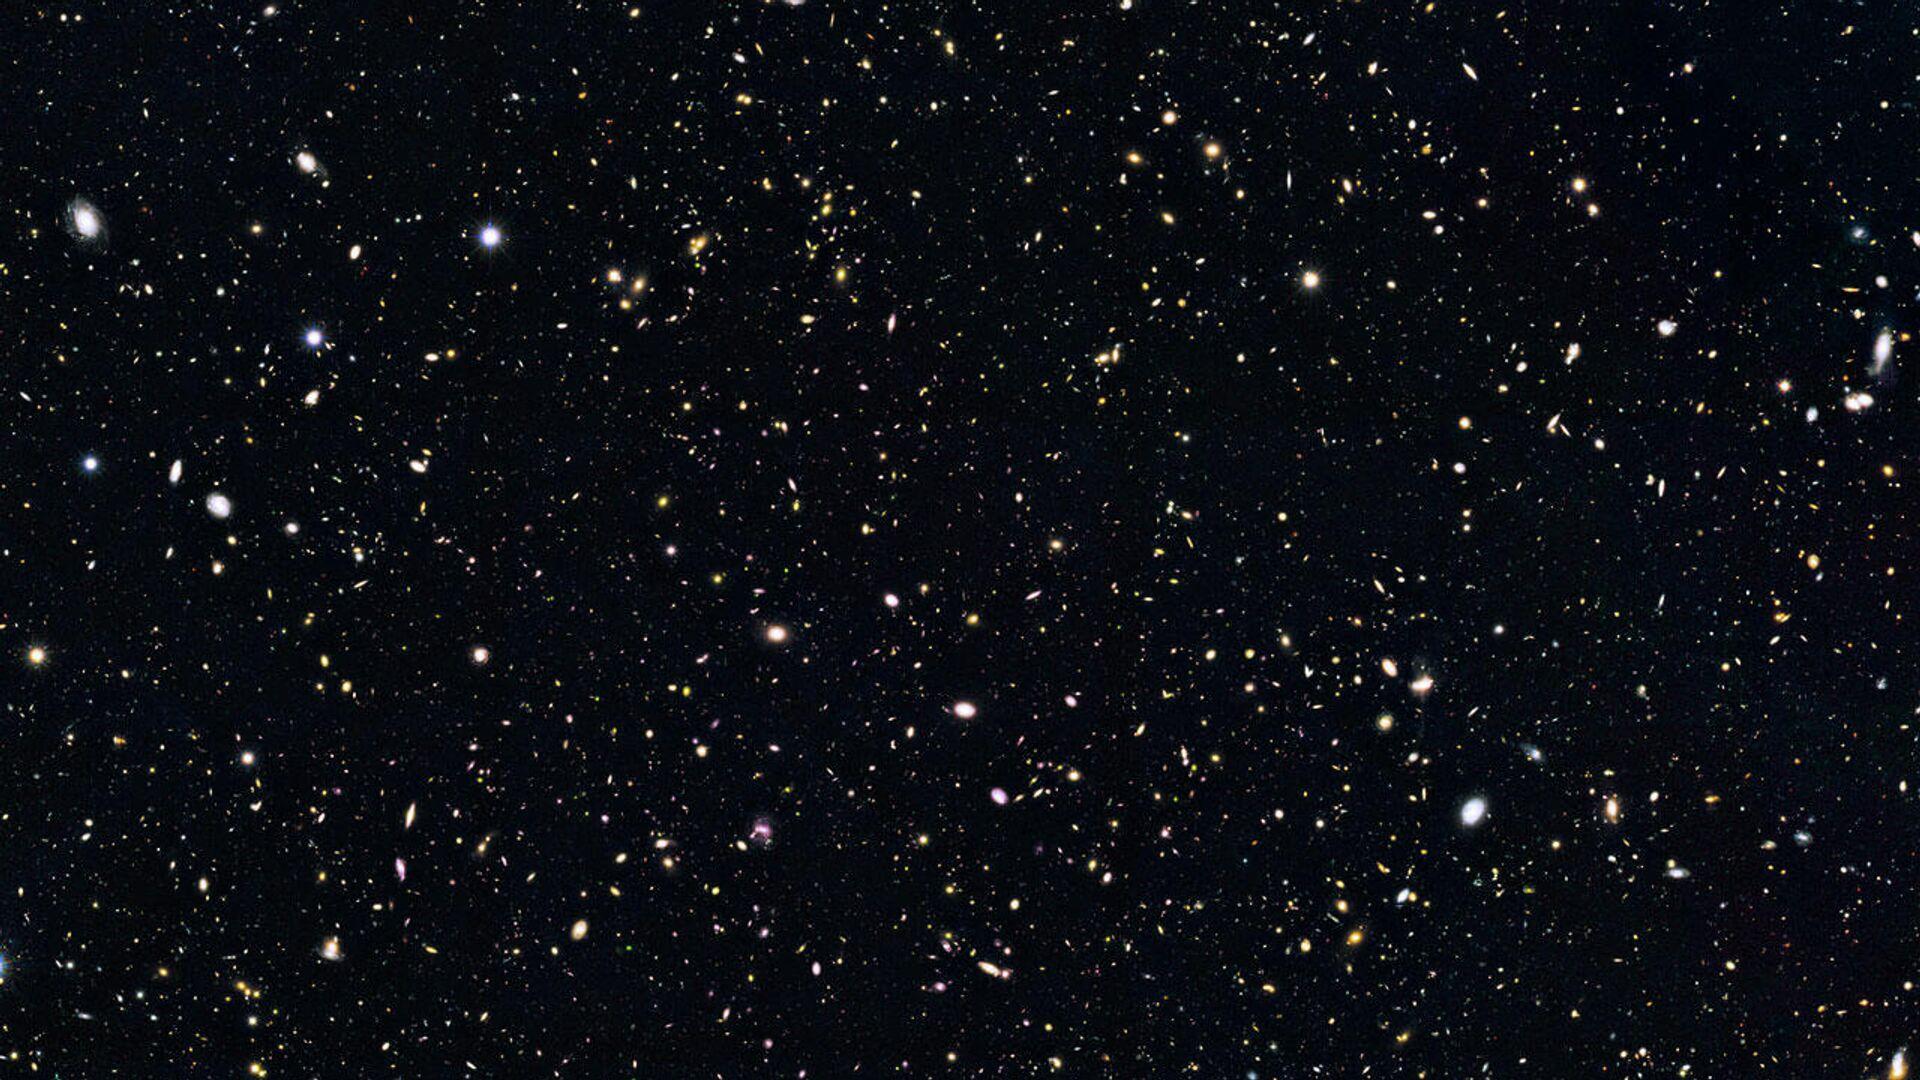 Cielo profundo dede el Hubble - Sputnik Mundo, 1920, 11.06.2021